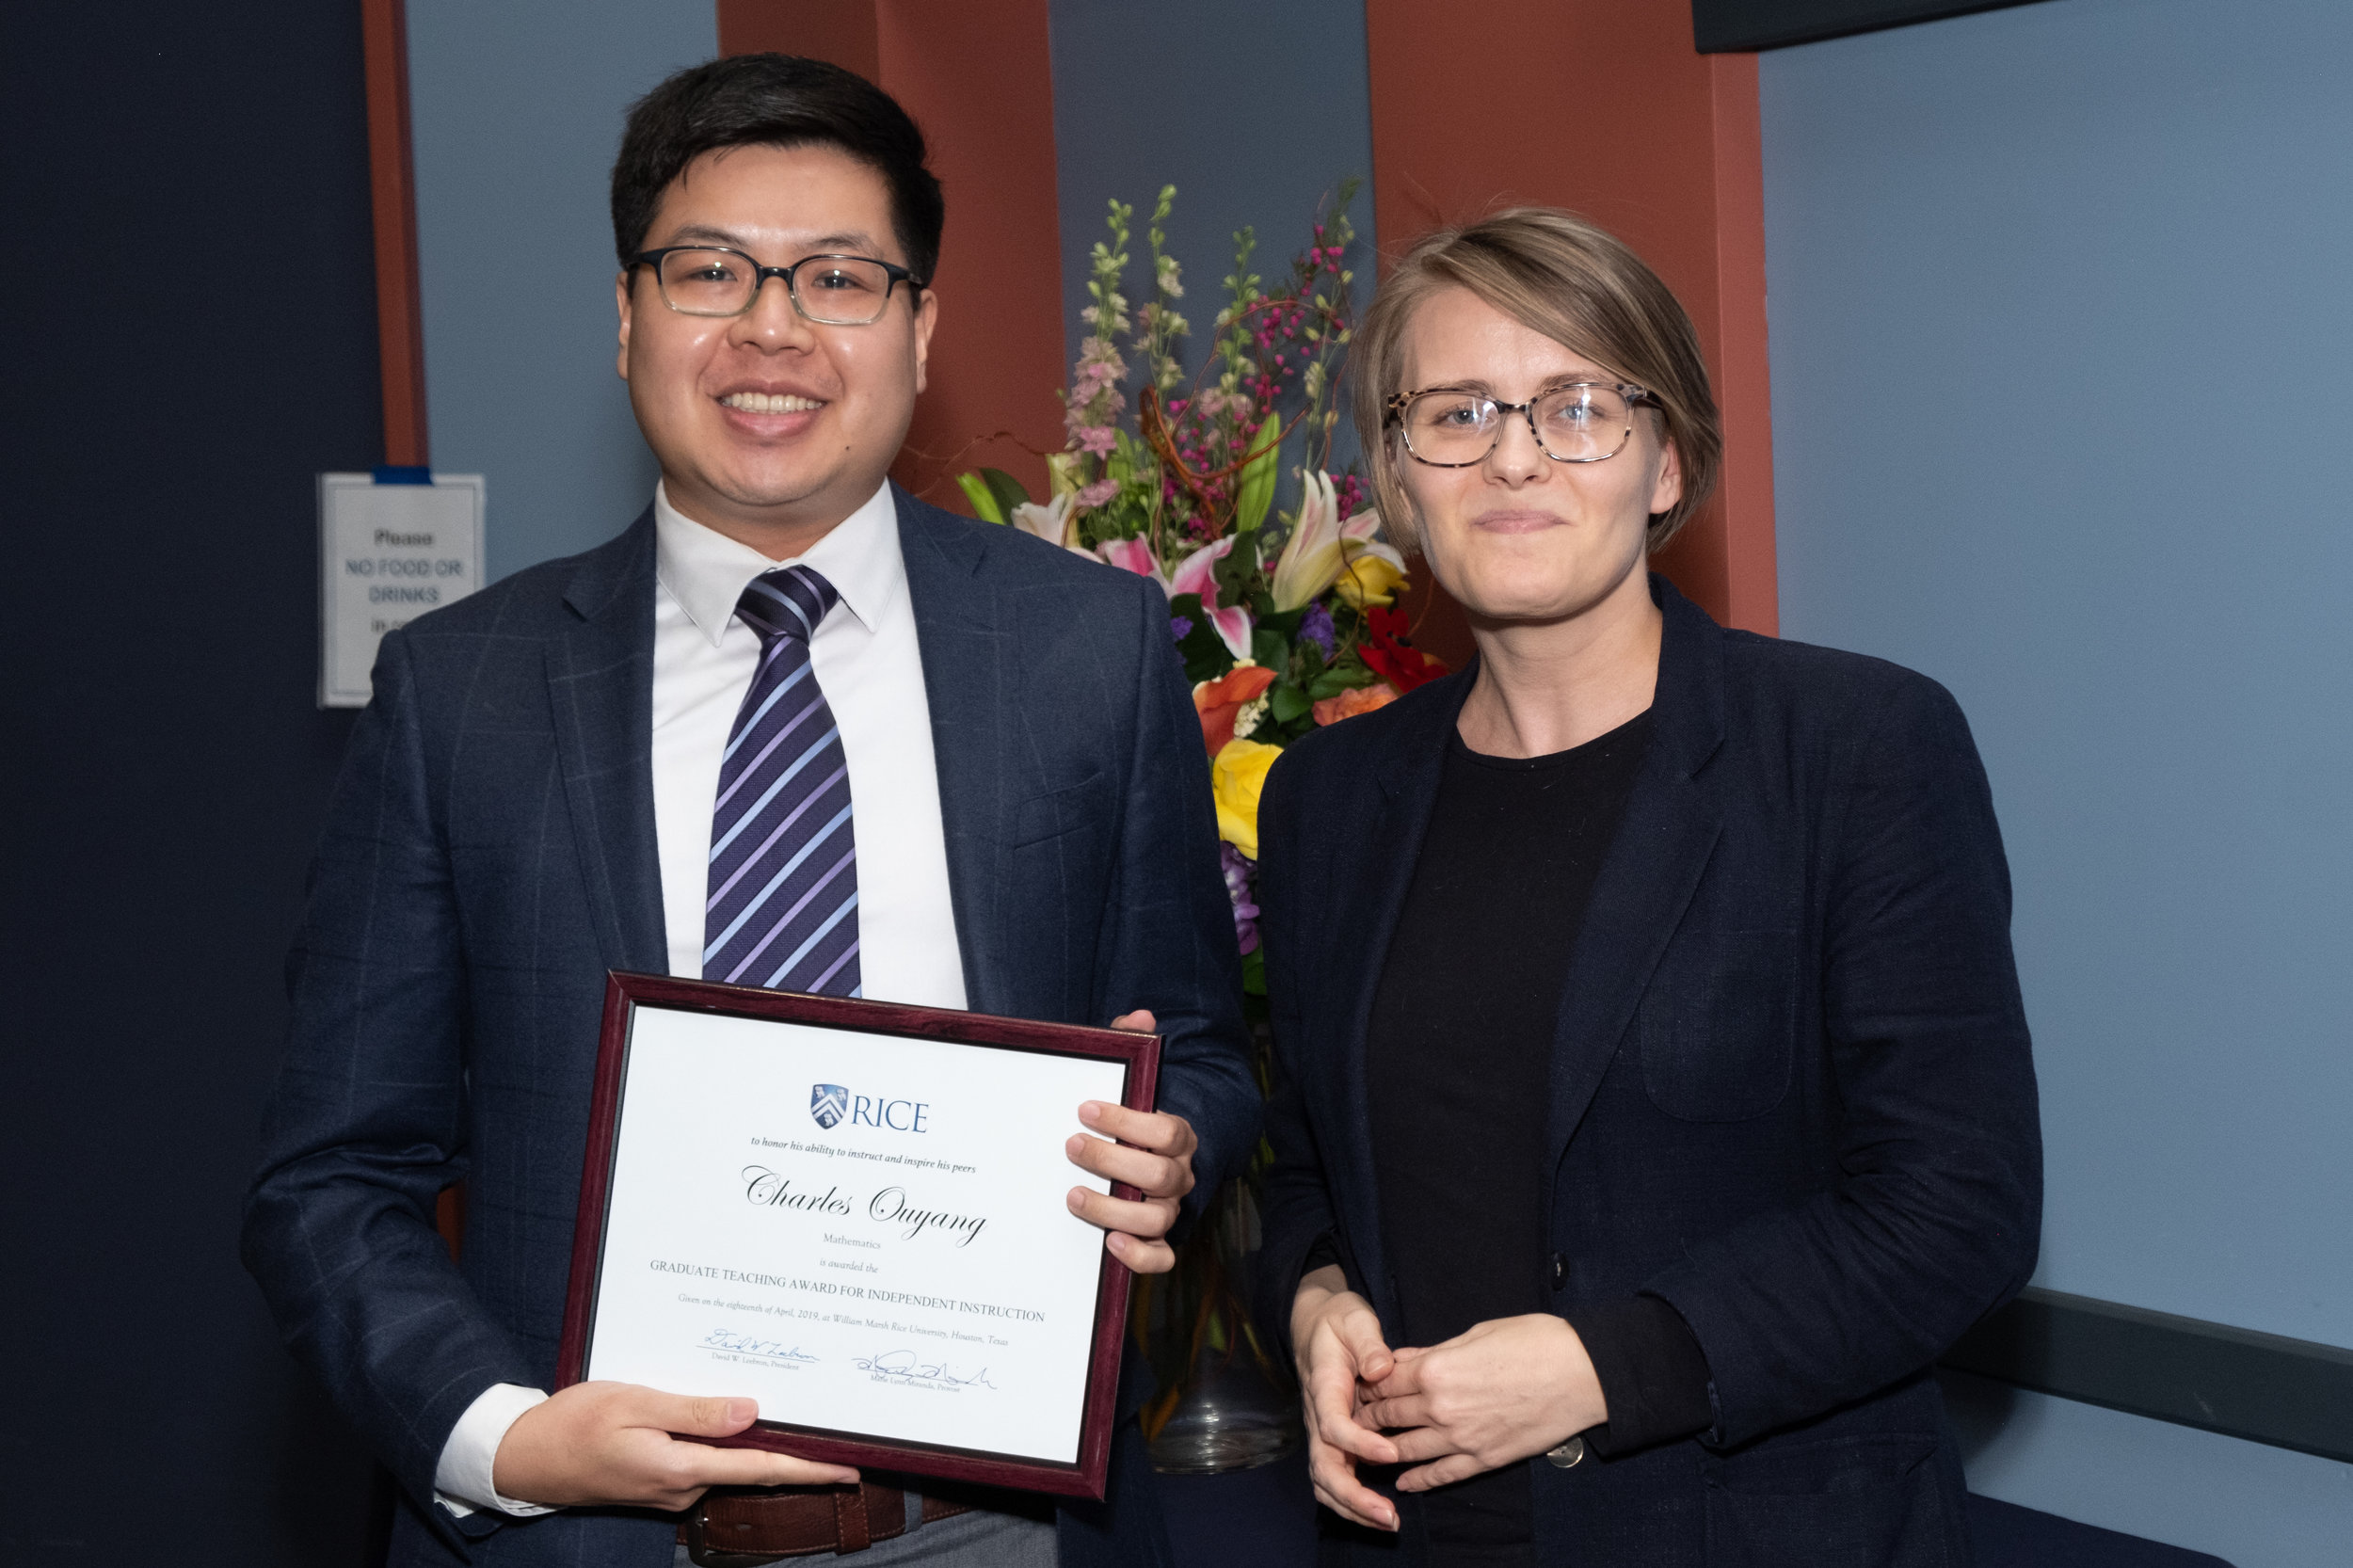 Ania Kowalik, CTE Assistant Director & Charles Ouyang, Graduate Teaching Award for Independent Instruction